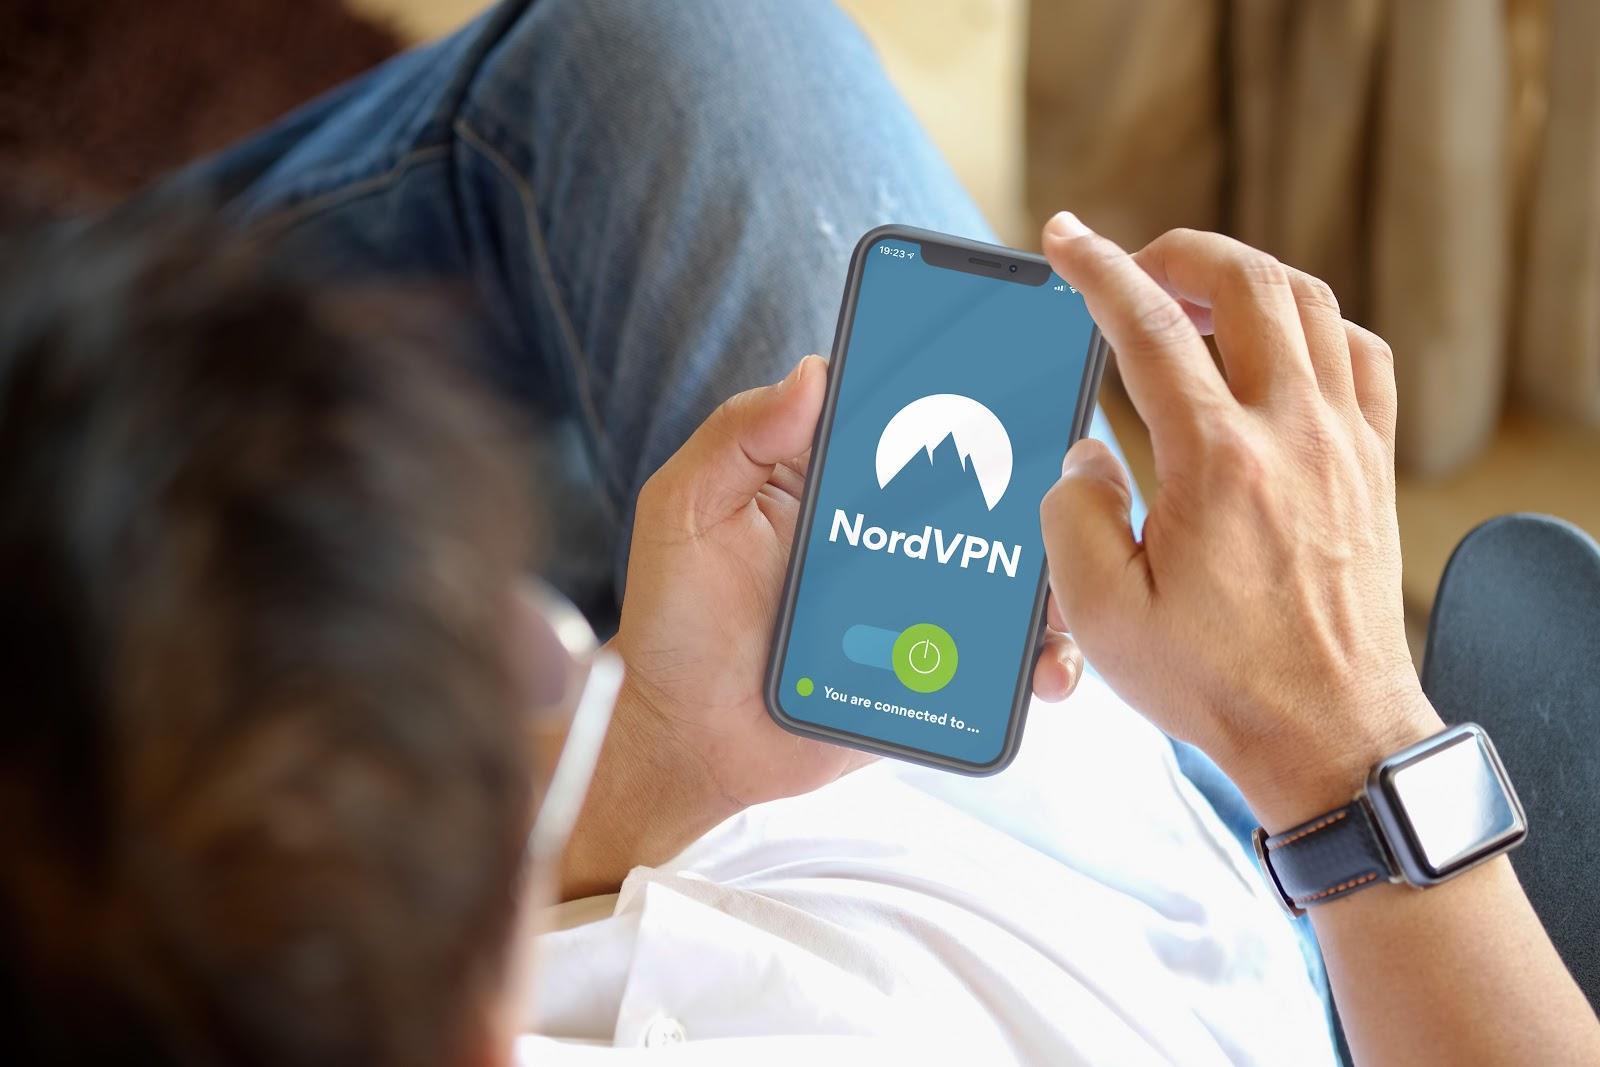 NordVPN on a smartphone